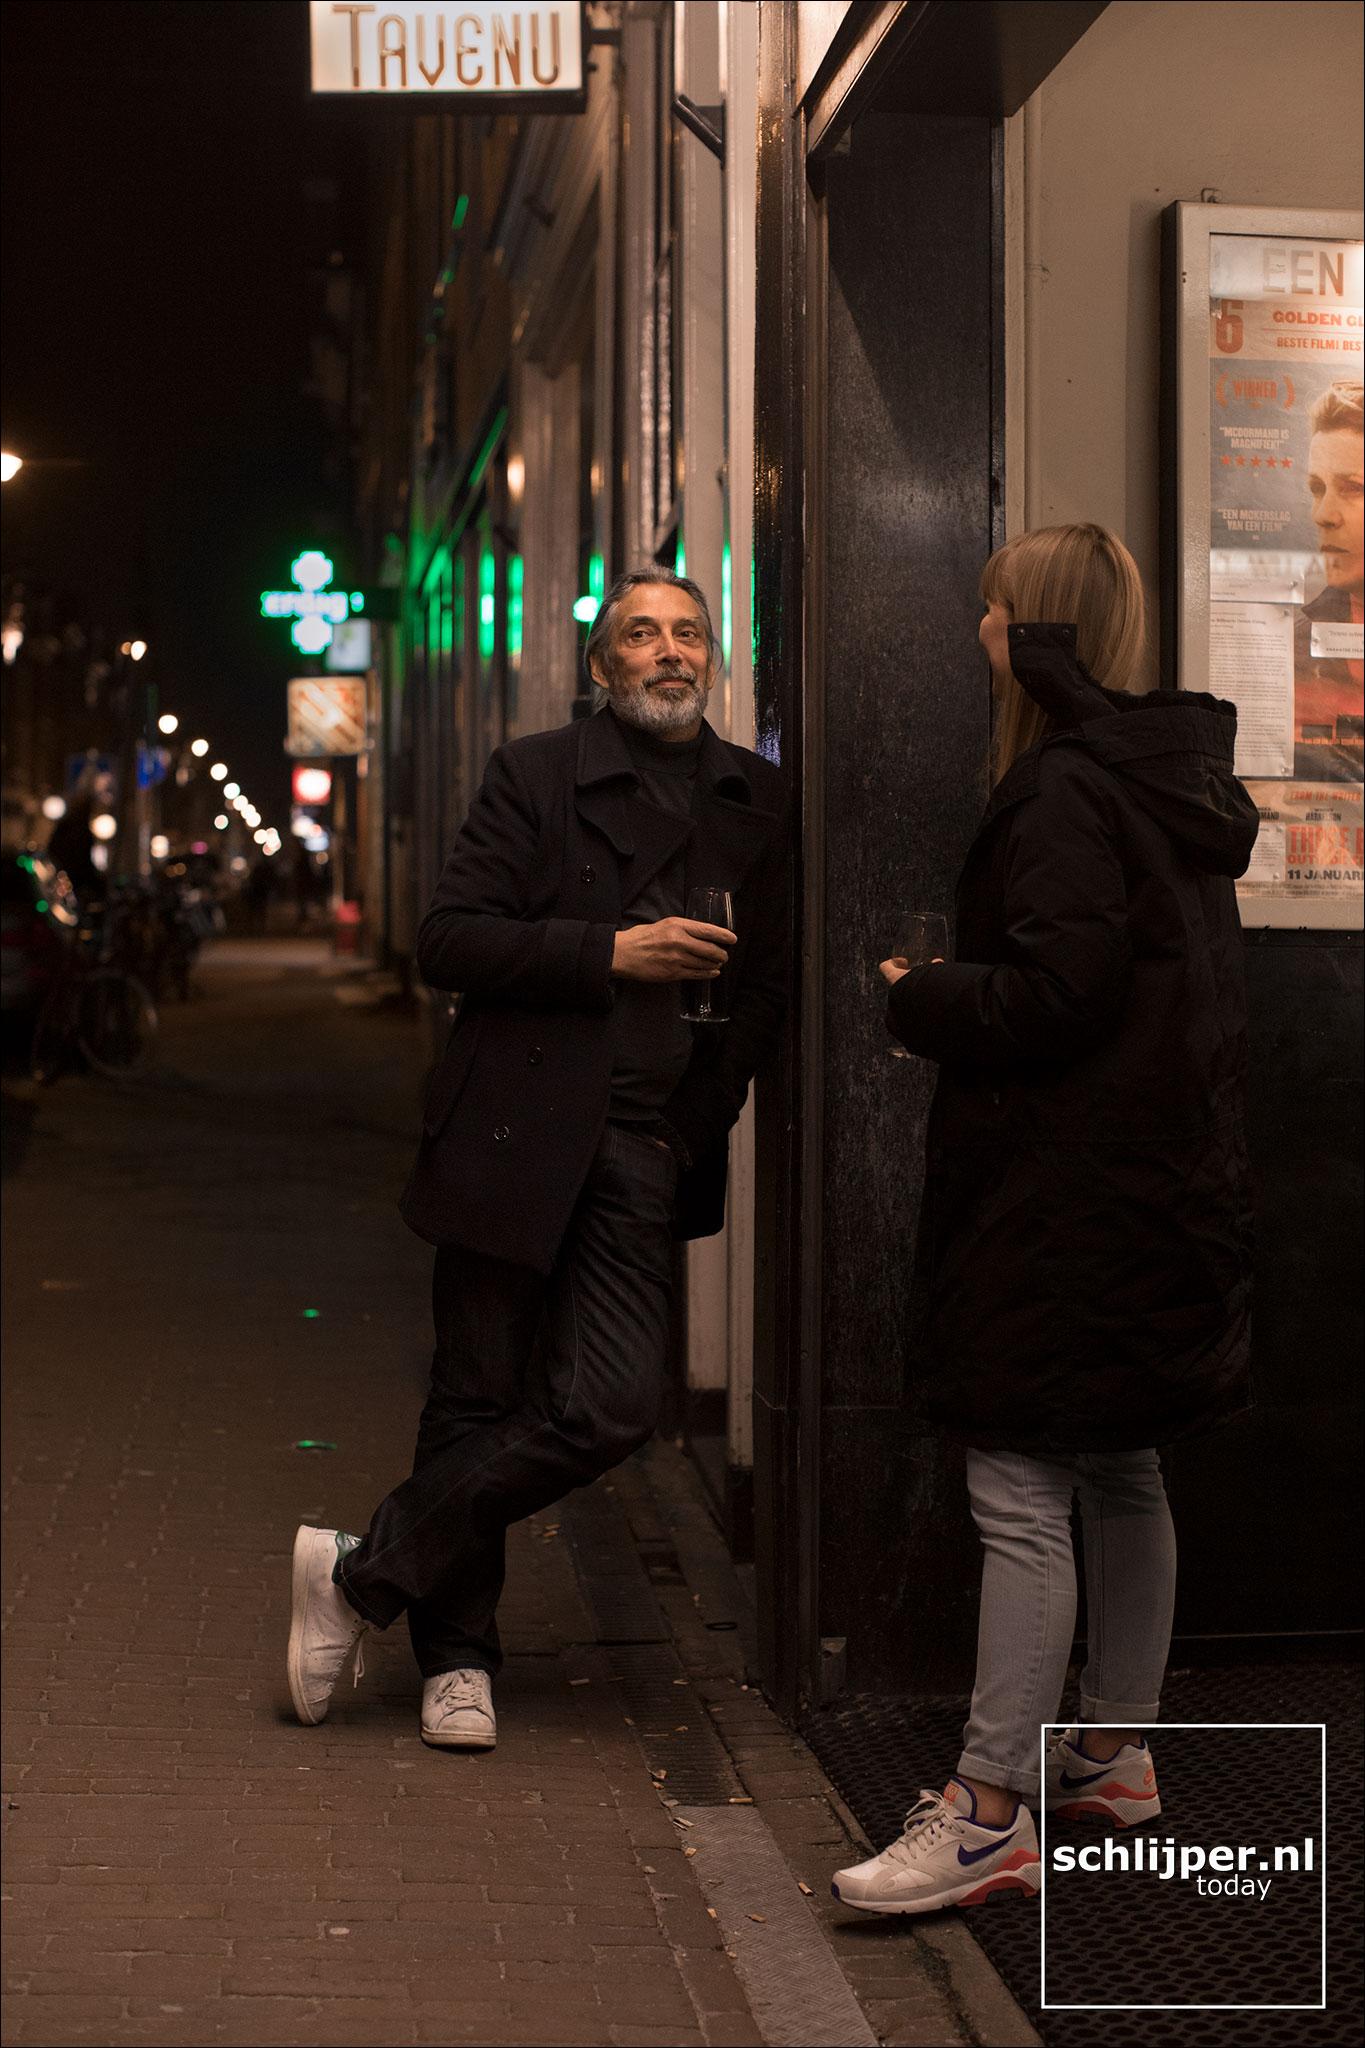 Nederland, Amsterdam, 26 februari 2018